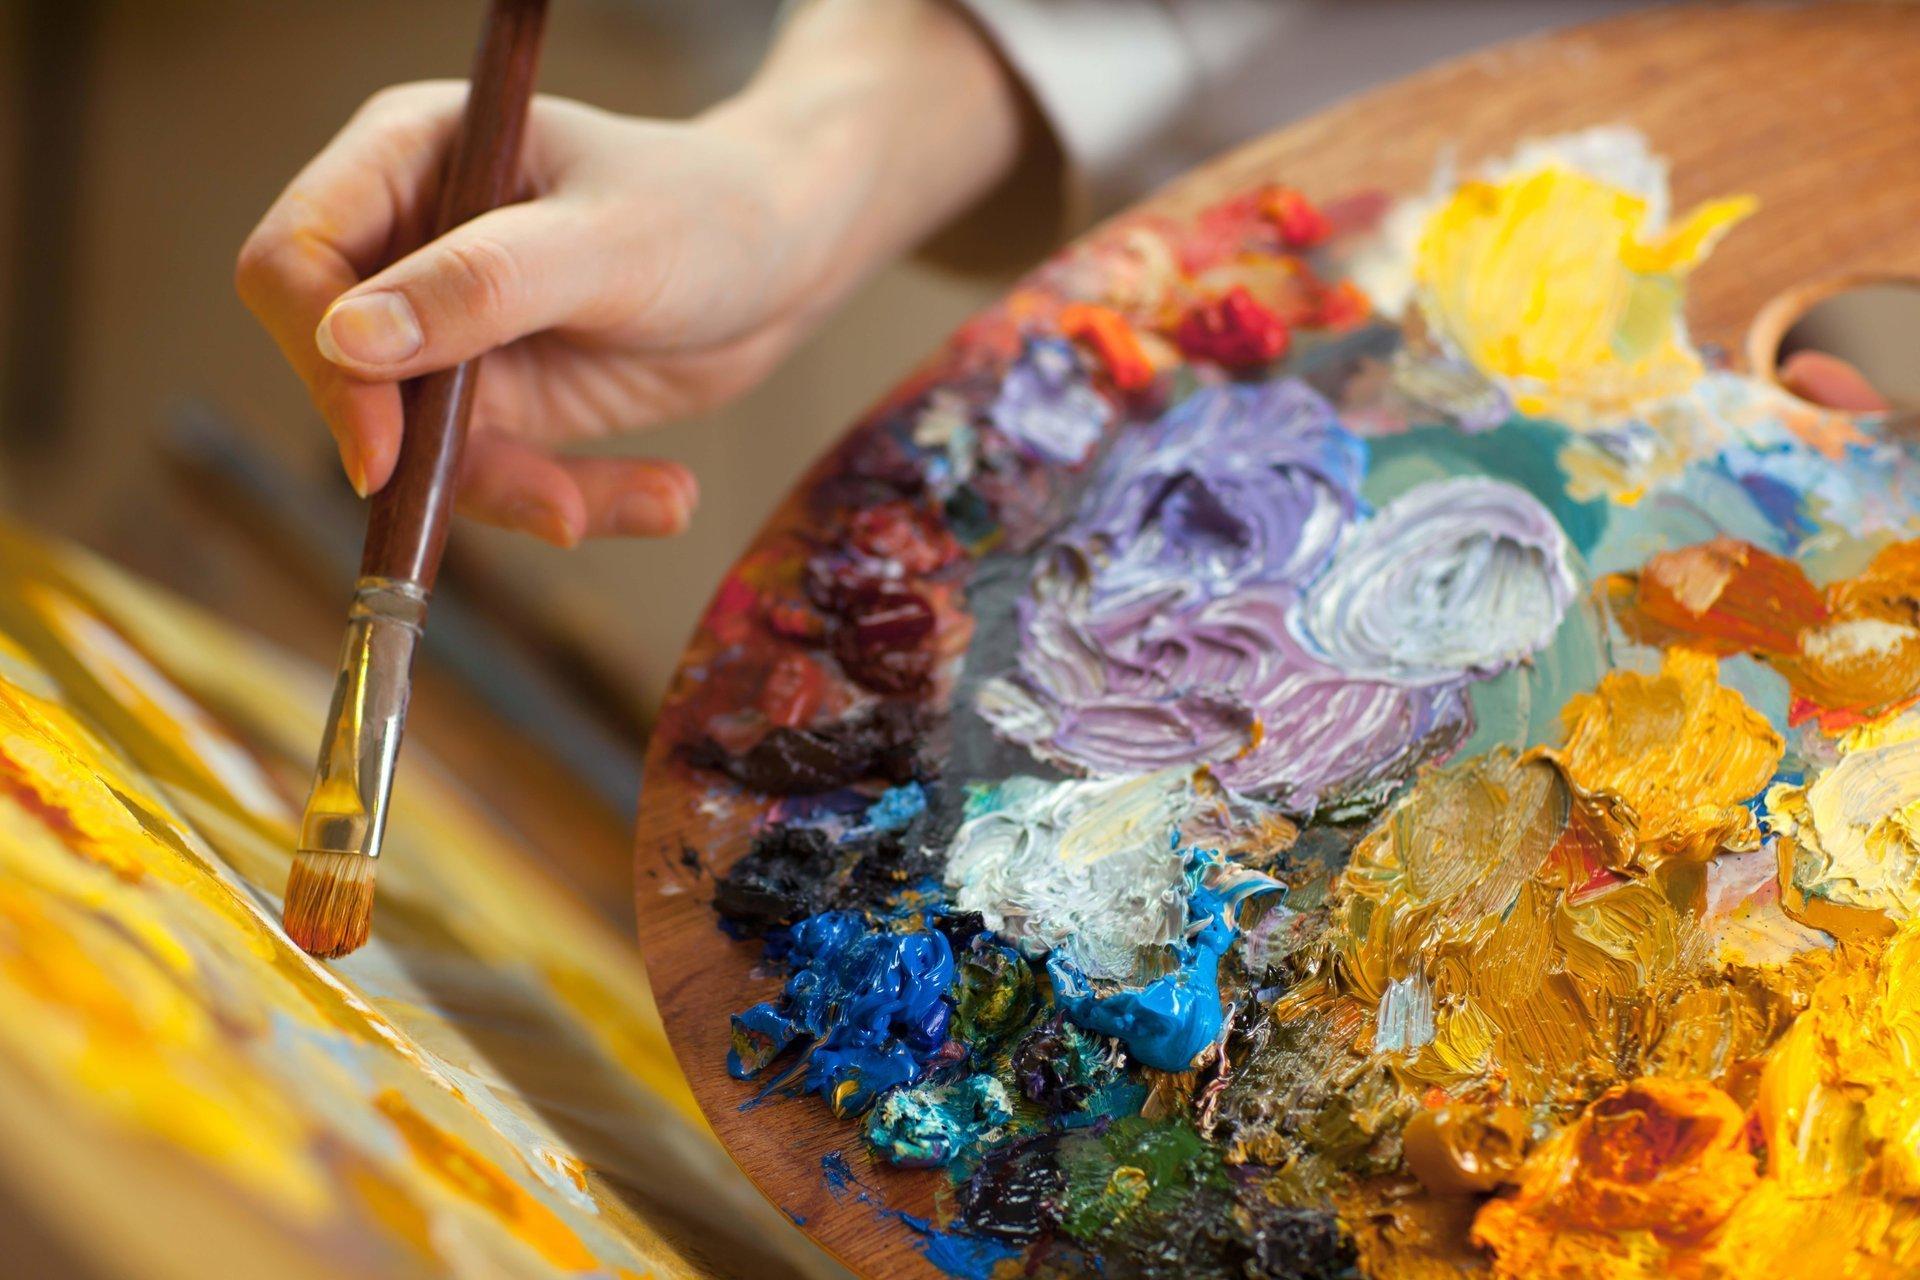 the-artist-drawing-palette-color-paint-easel-brush-creativity-art-good-idea-close-up-blur-bokeh-wallpaper[1].jpg